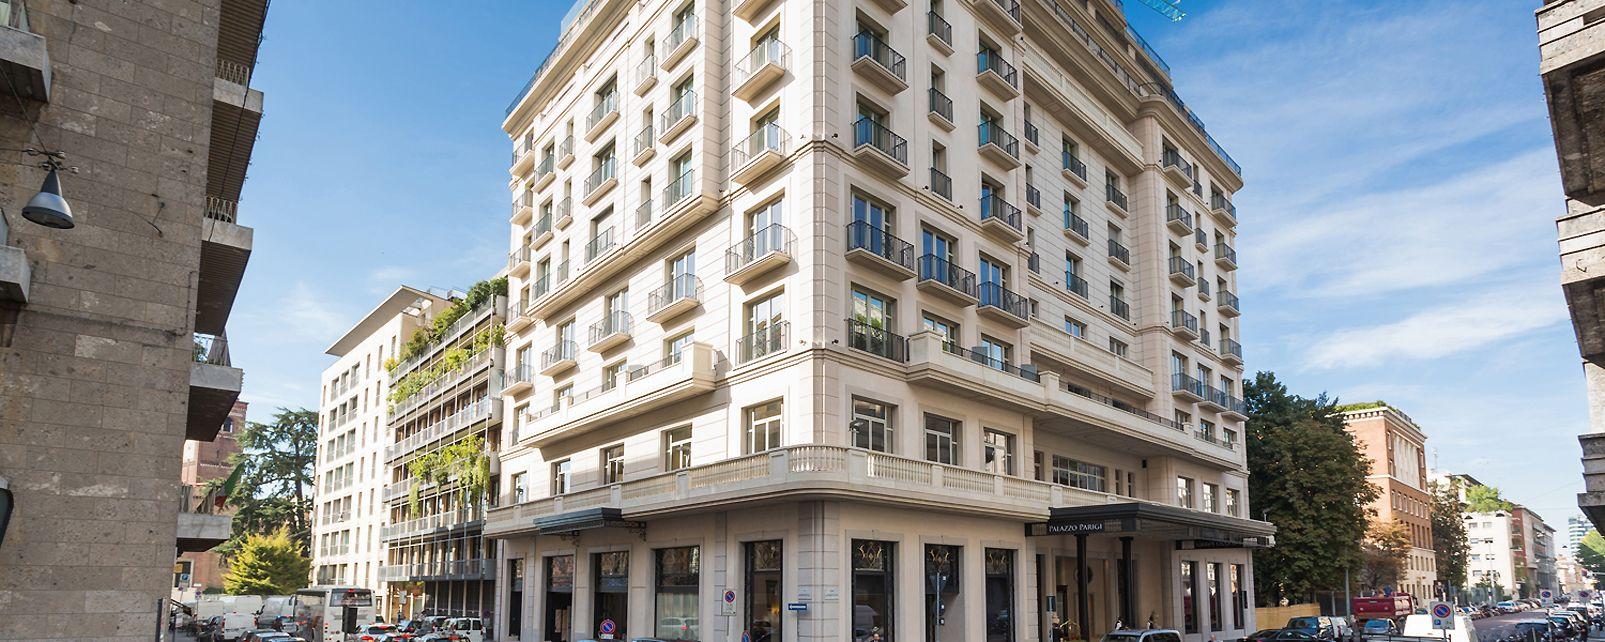 Hotel Palazzo Parigi